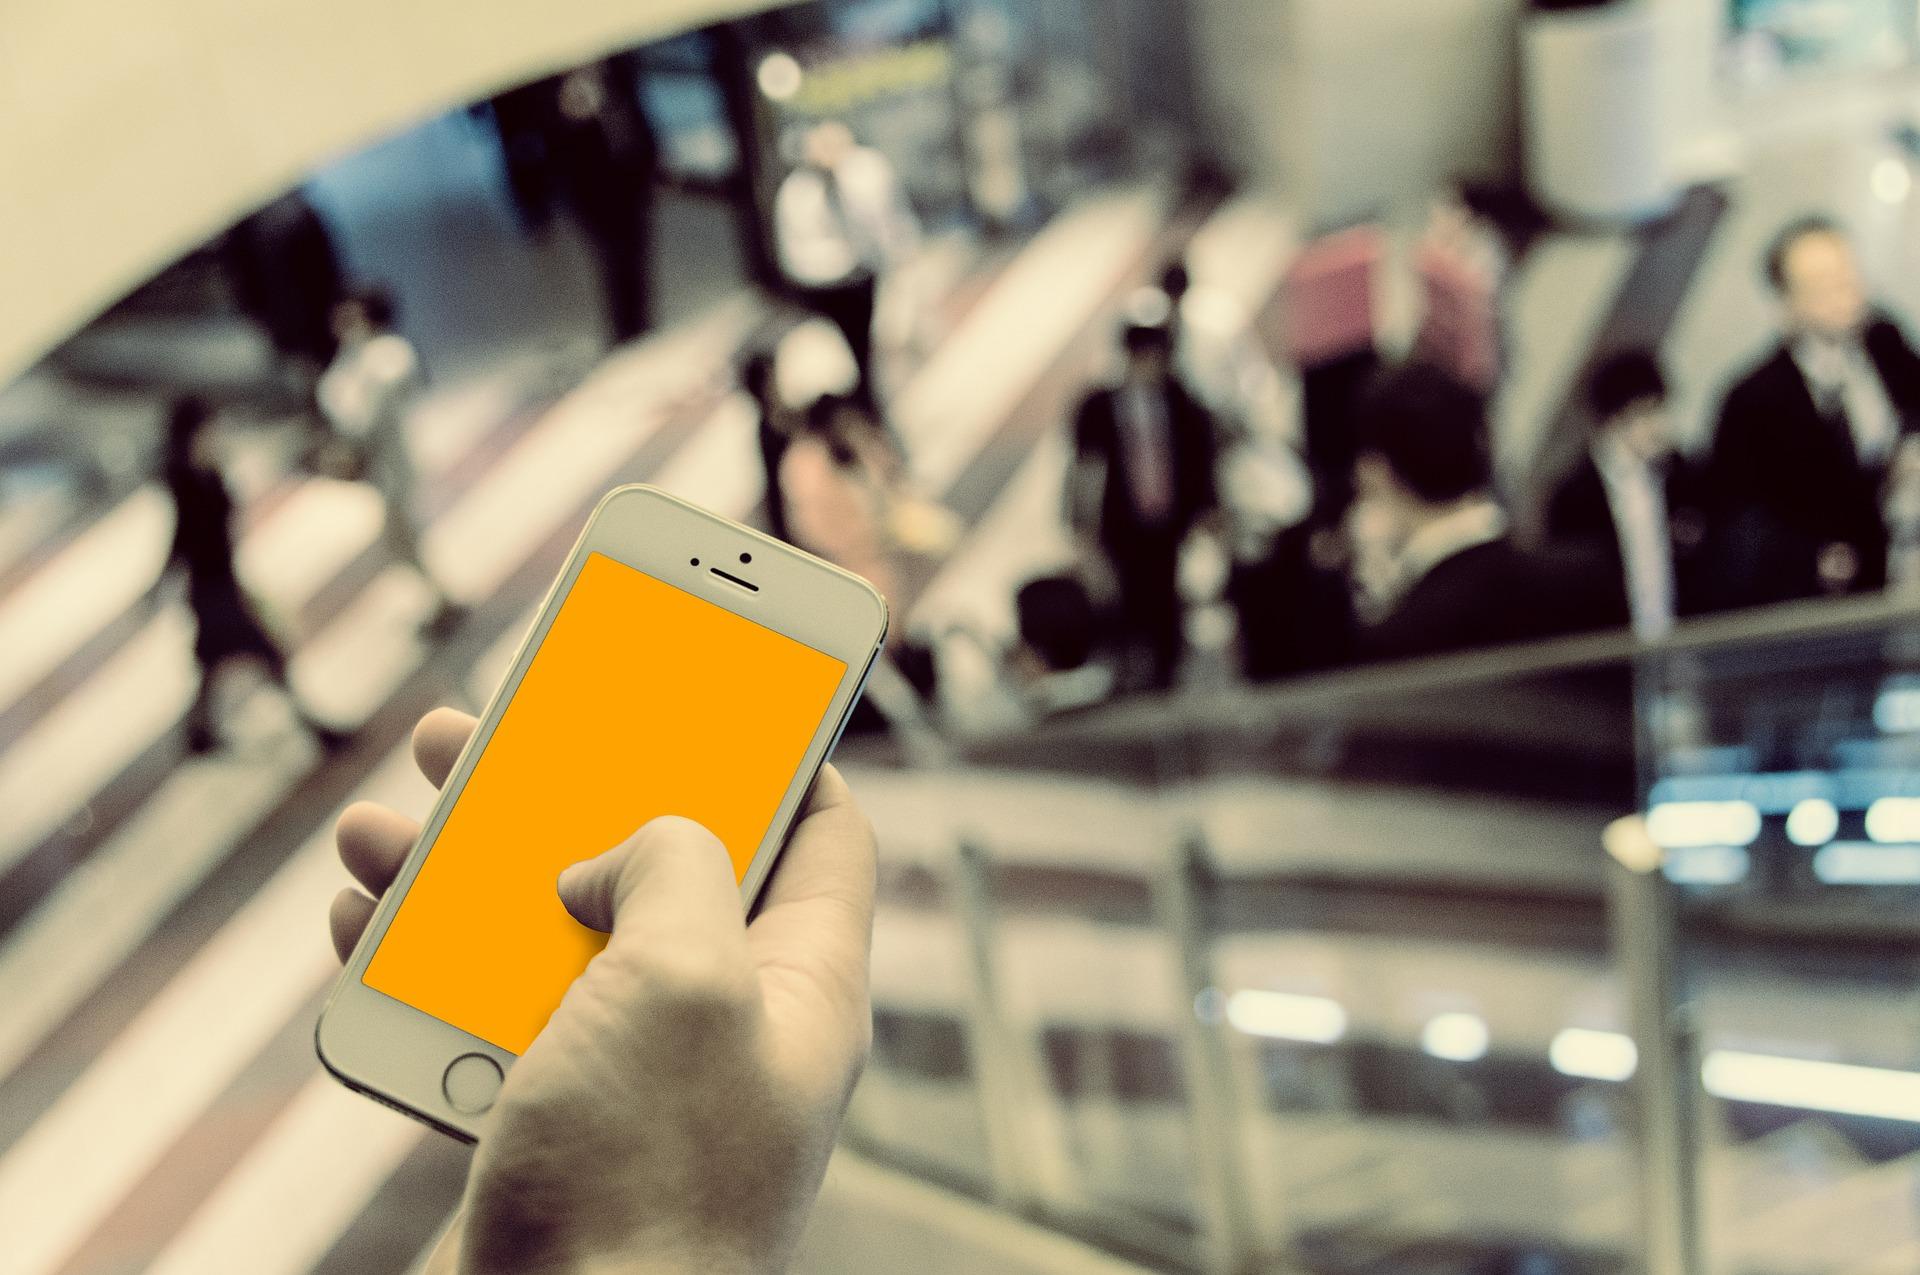 Hanacell , ハナセル, SIM, プリペイド, 一時帰国, 携帯, 海外在住